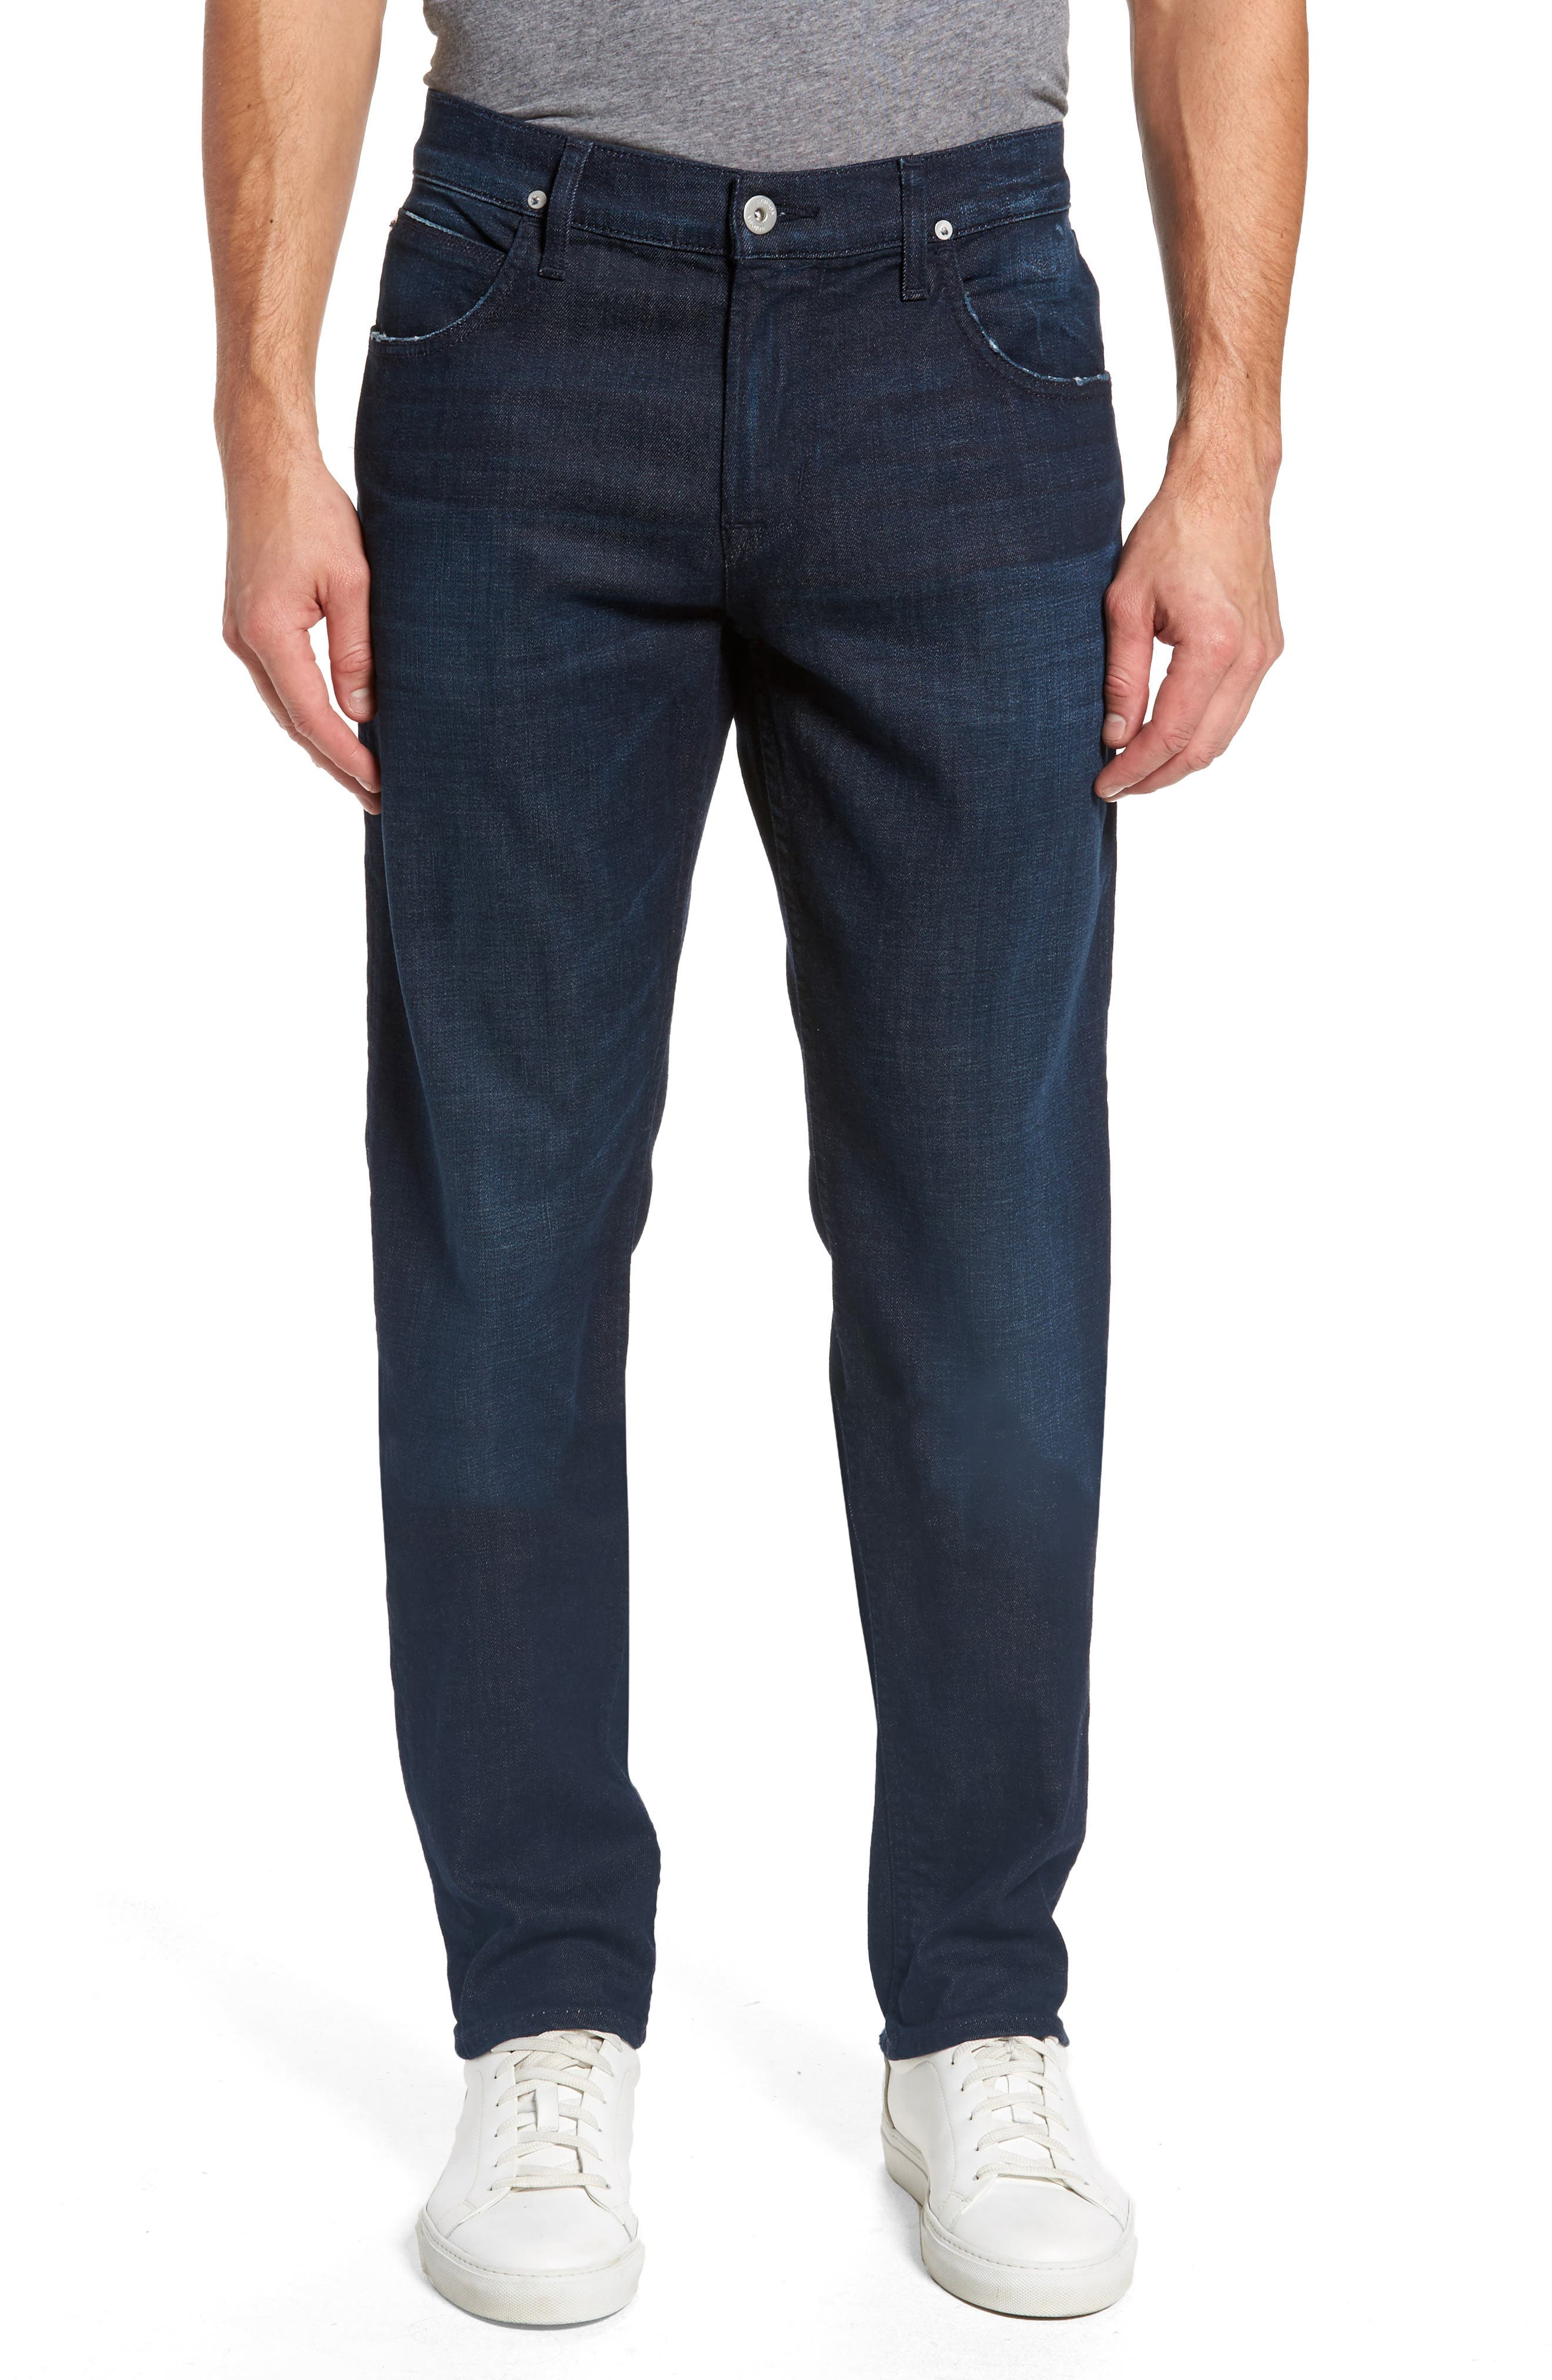 Main Image - Hudson Jeans Blake Slim Fit Jeans (Evening Hush)